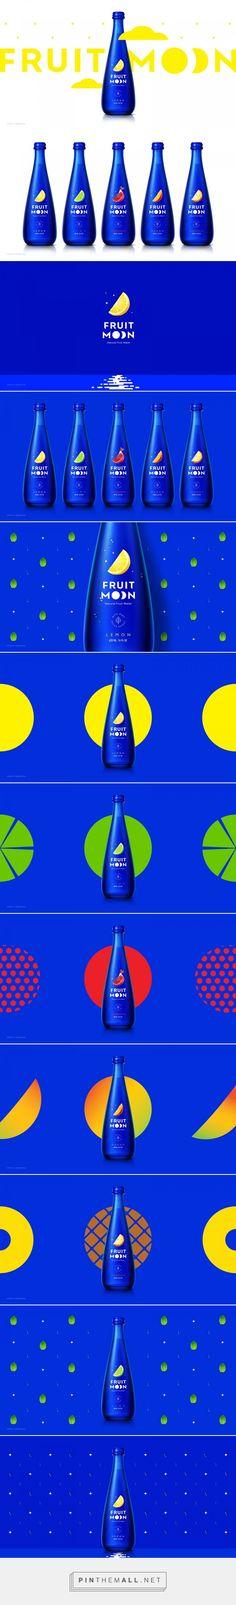 Fruit Moon beverage packaging design by Yaroslav Zheleznyakov - http://www.packagingoftheworld.com/2017/06/fruit-moon.html